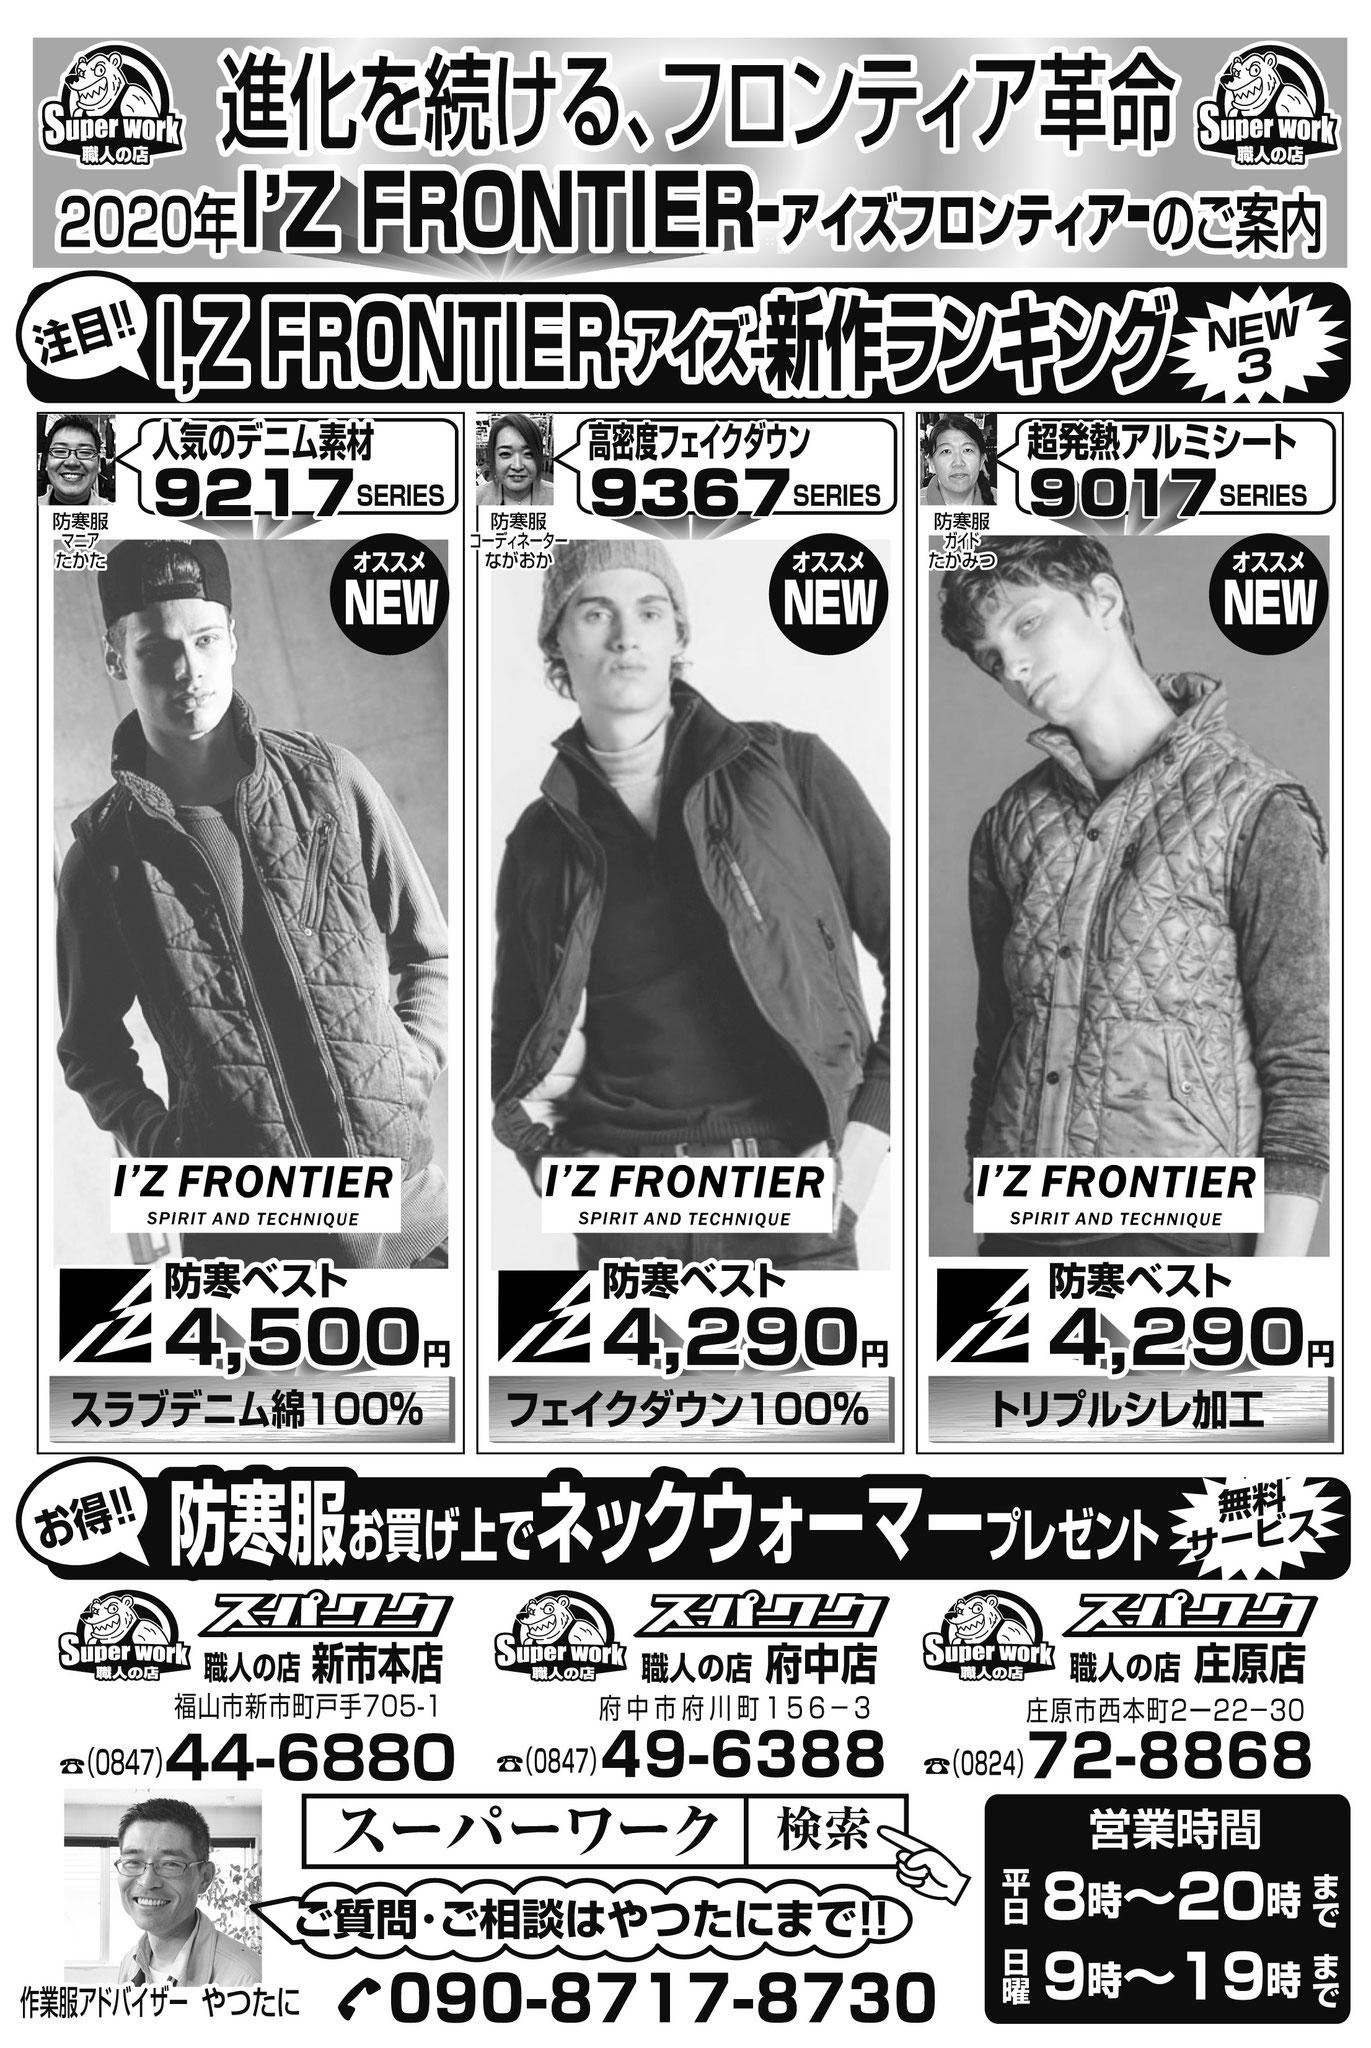 I'Z FRONTIER~アイズフロンティア~防寒ベストのご紹介